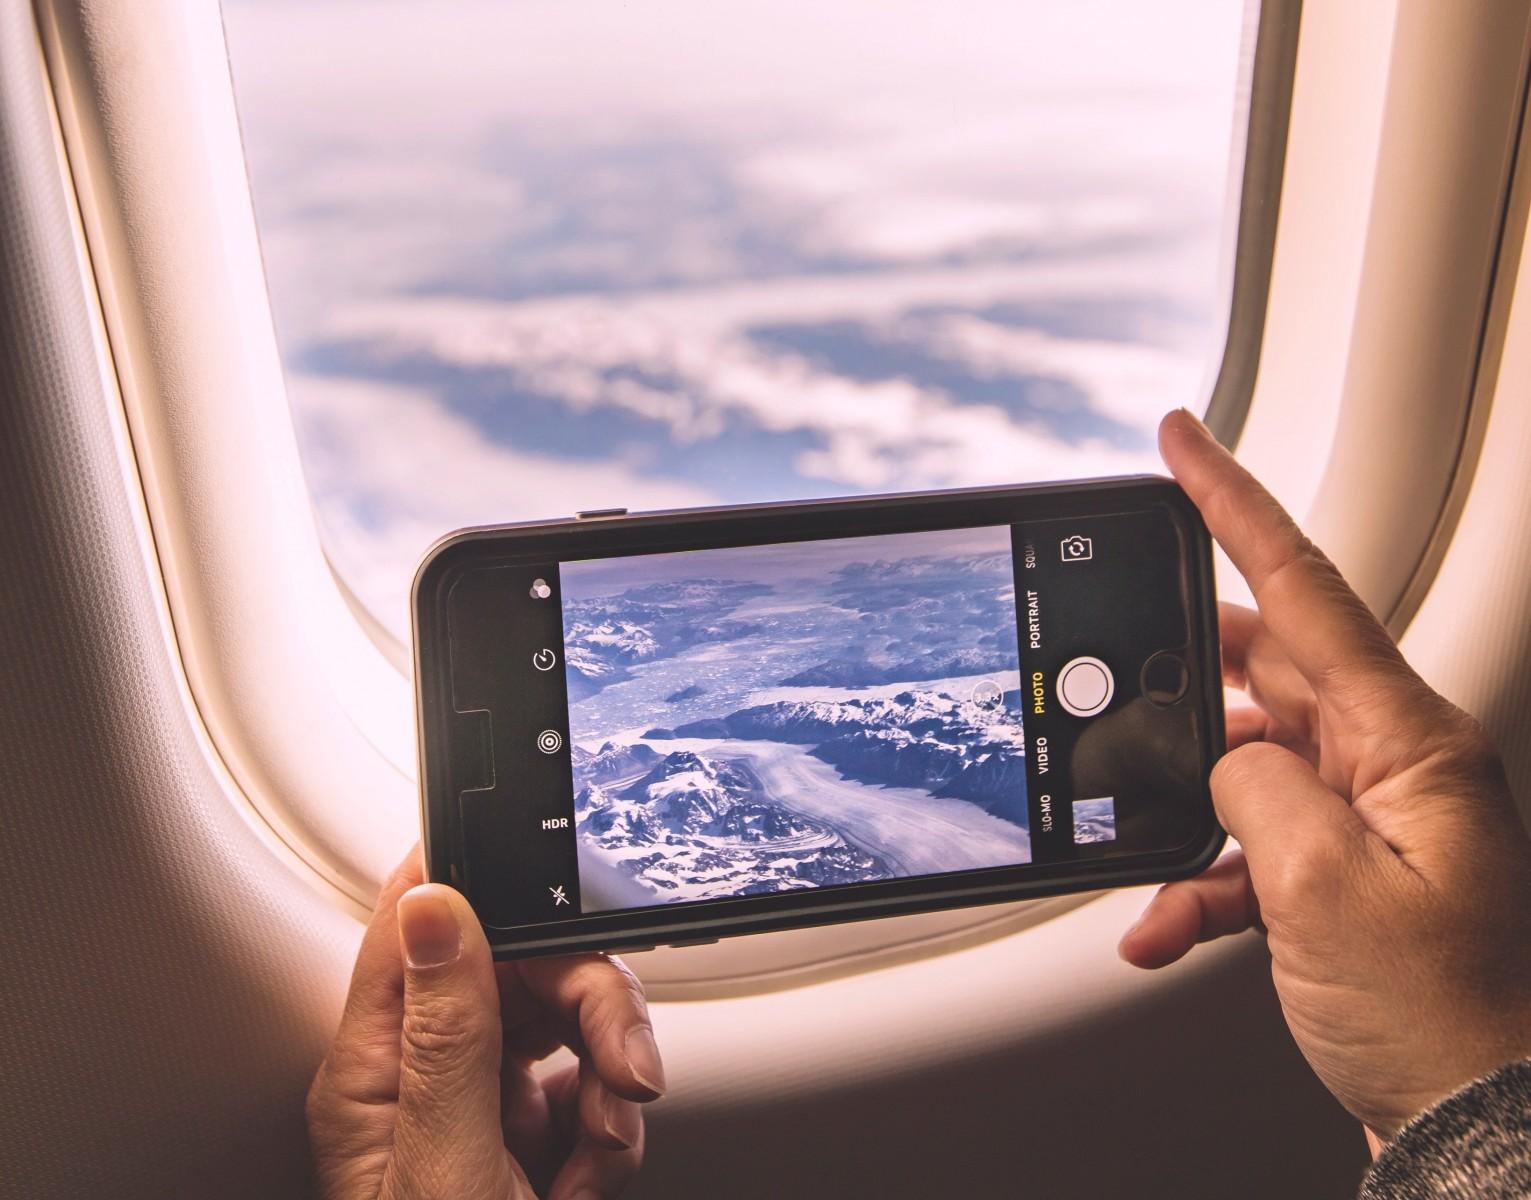 Booking com reveals 8 Travel Predictions for 2019 for